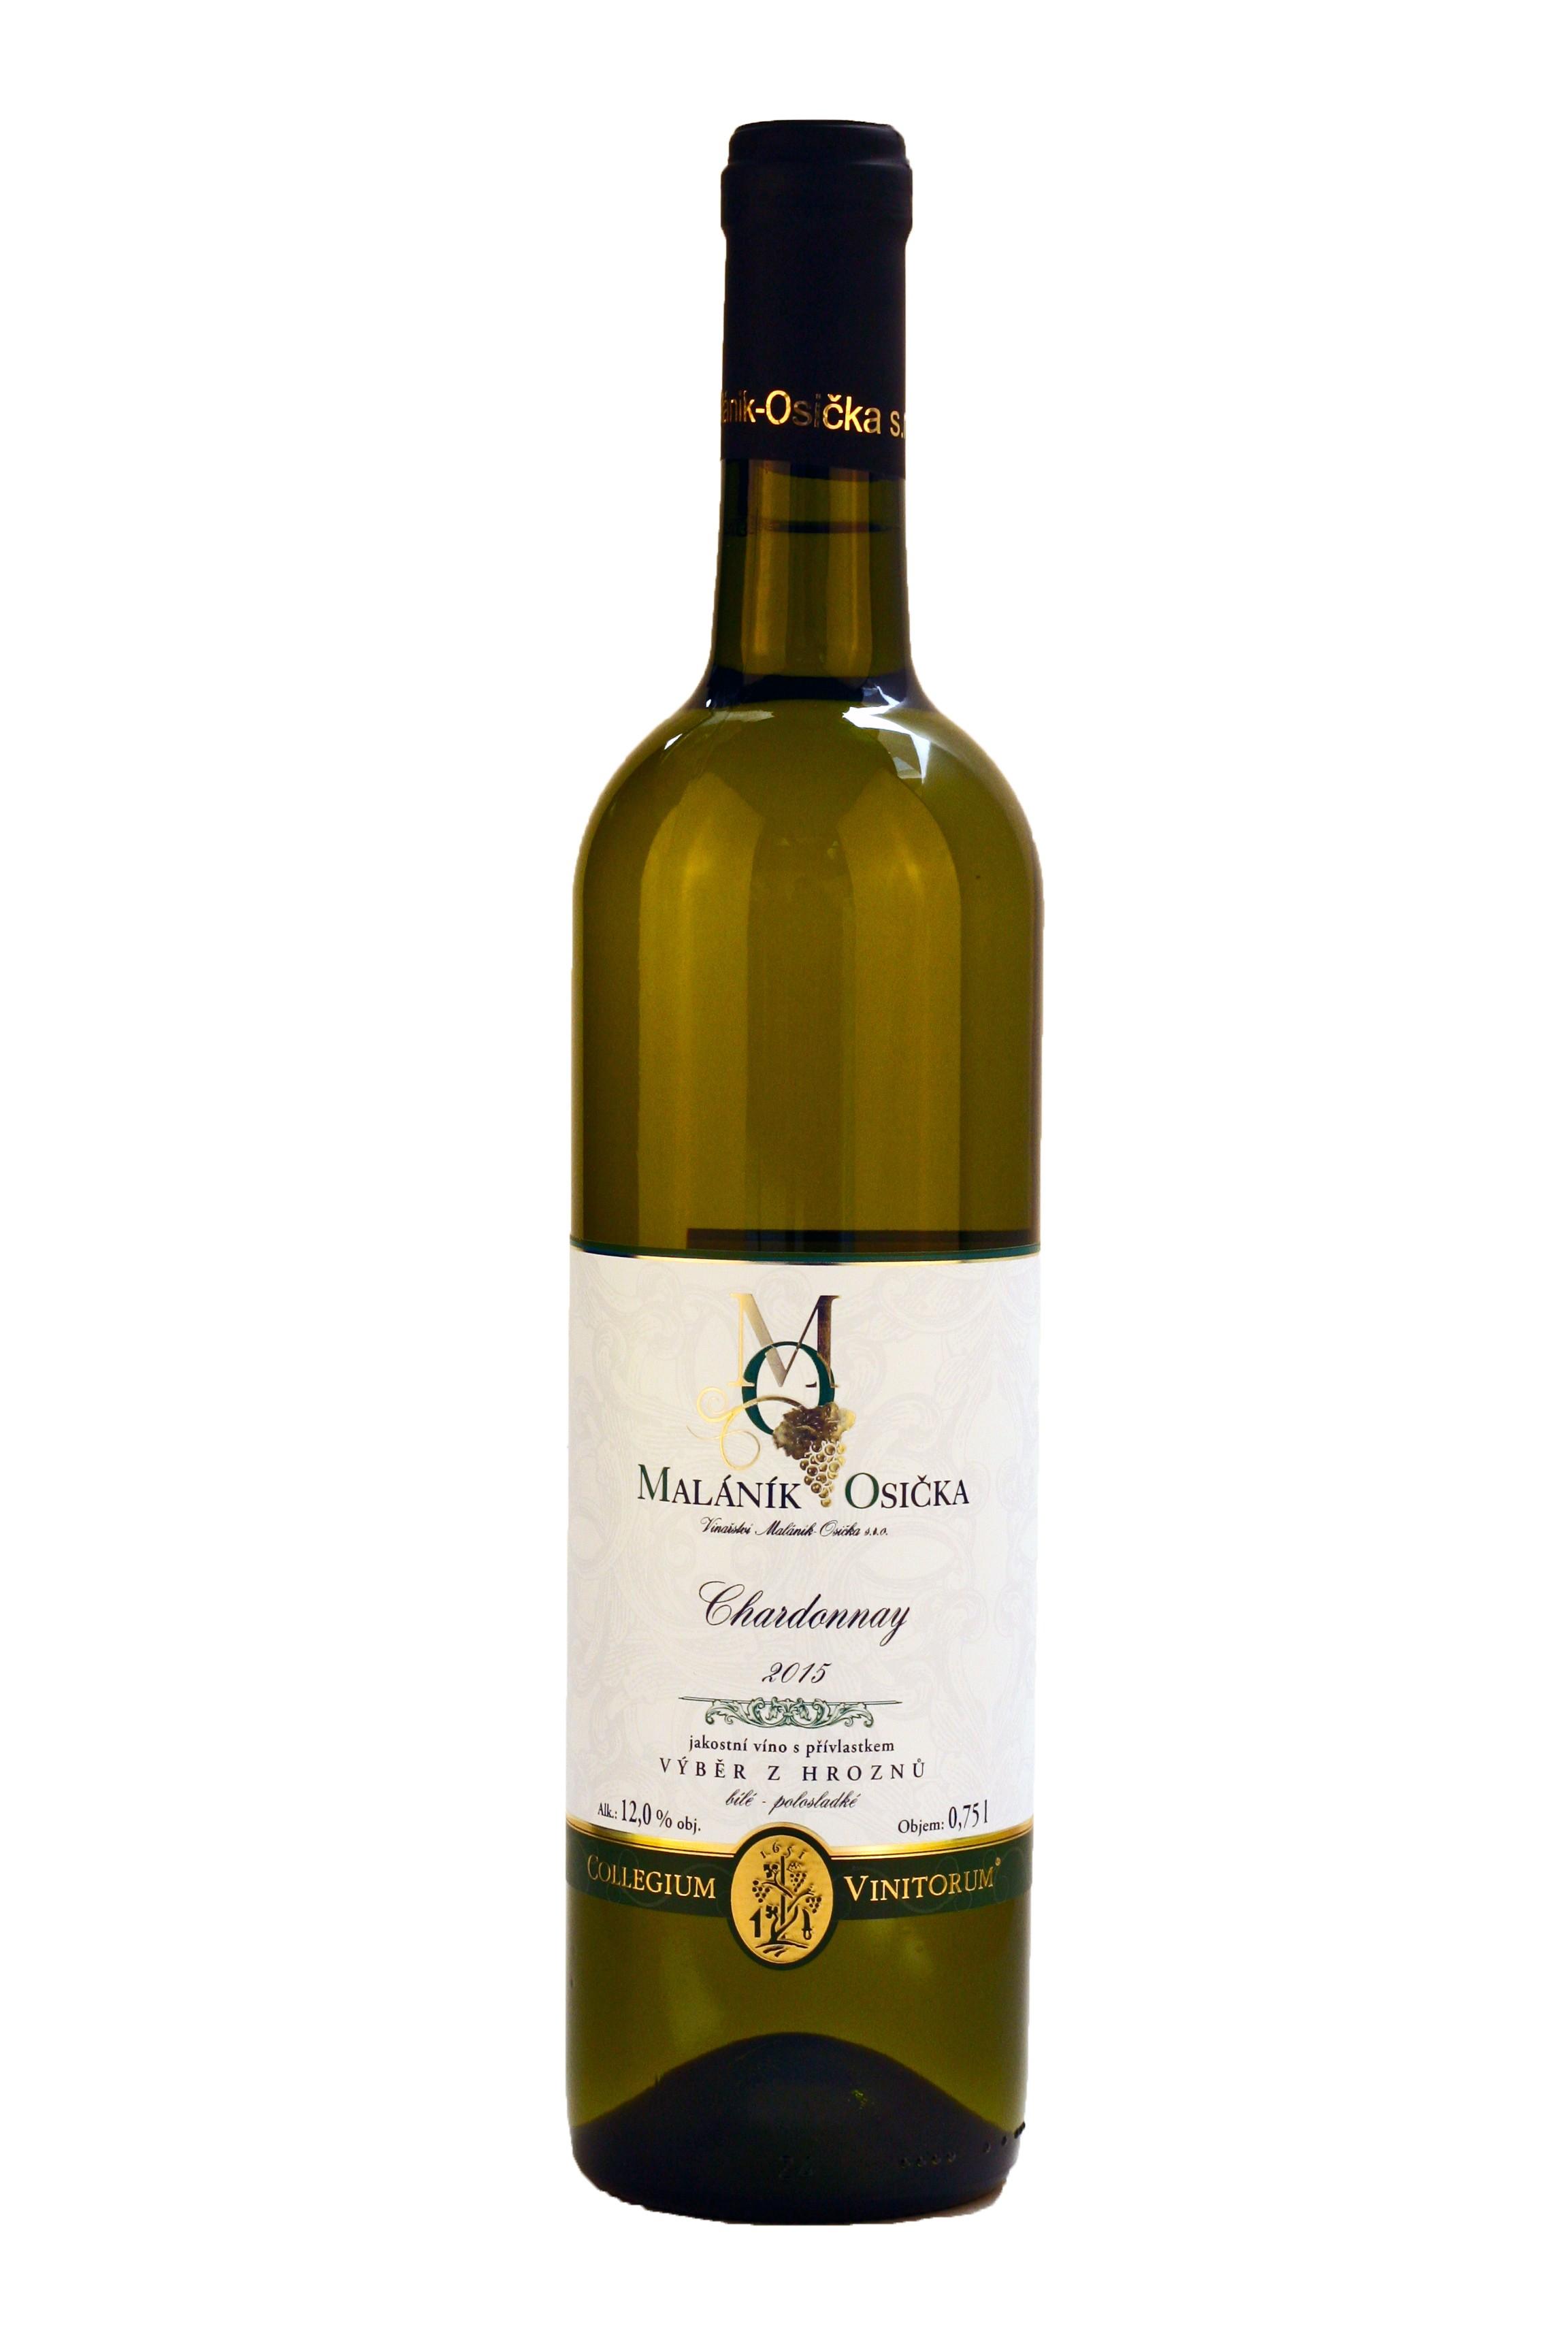 https://www.wineandgallery.cz/380-thickbox_default/chardonnay-.jpg